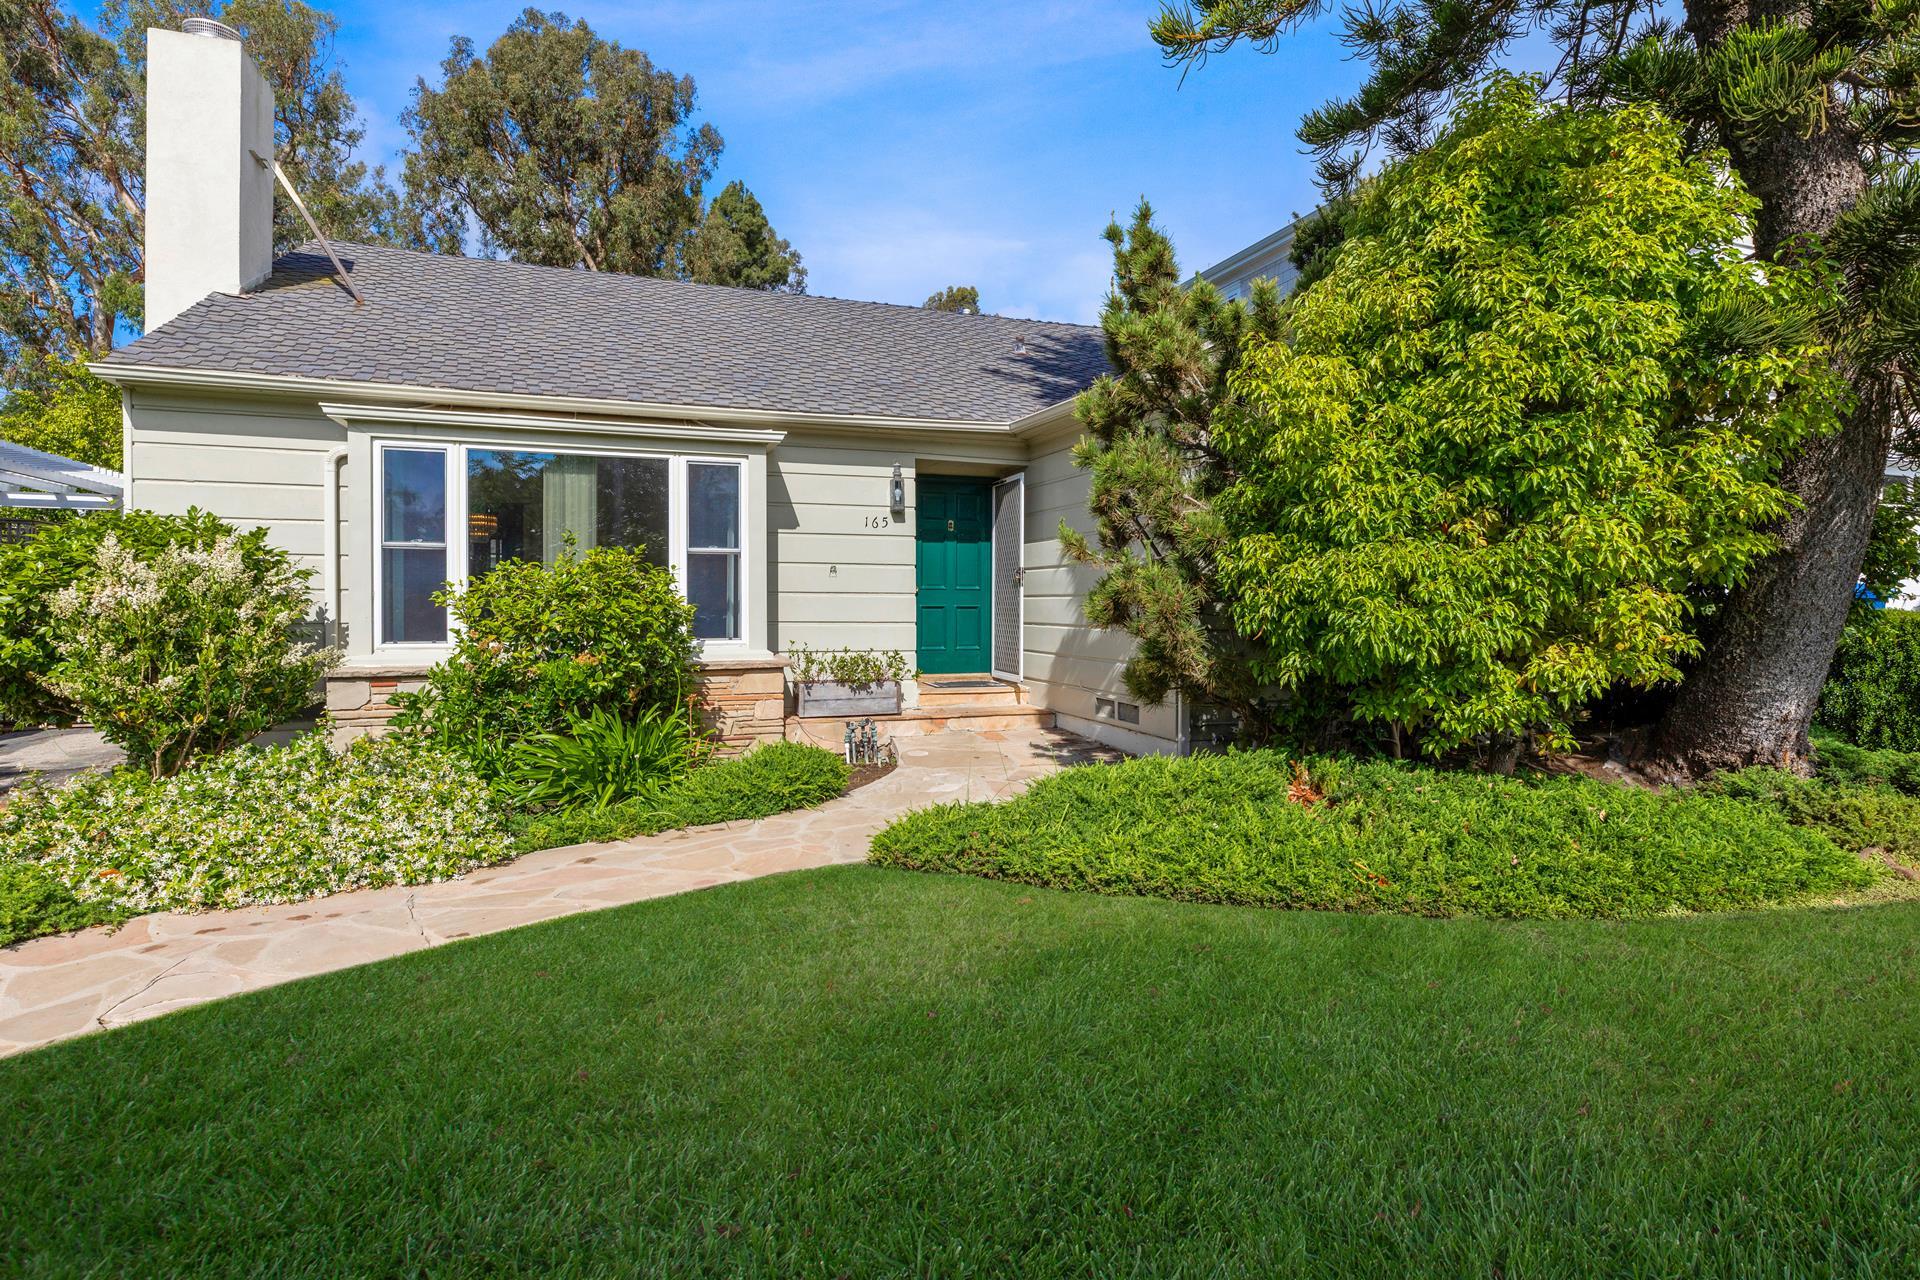 165 S GRETNA GREEN Way - Brentwood, California